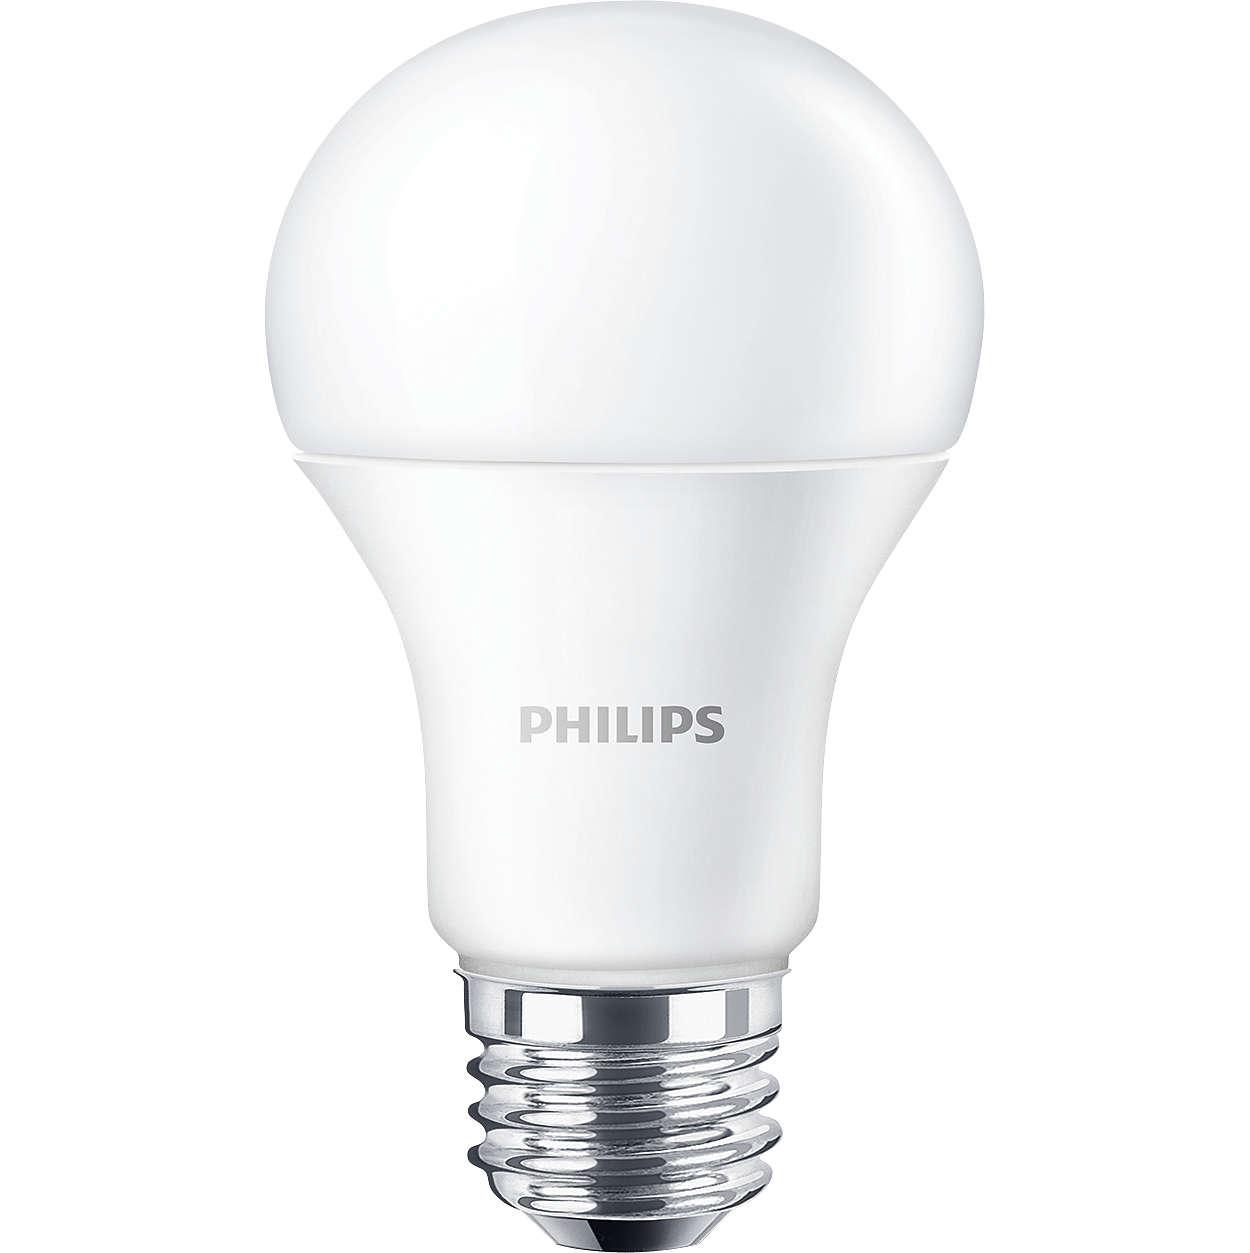 #P929001162202 - 9.5-60W 220V E27 830 806lm COREPRO LED AMPUL PHILIPS